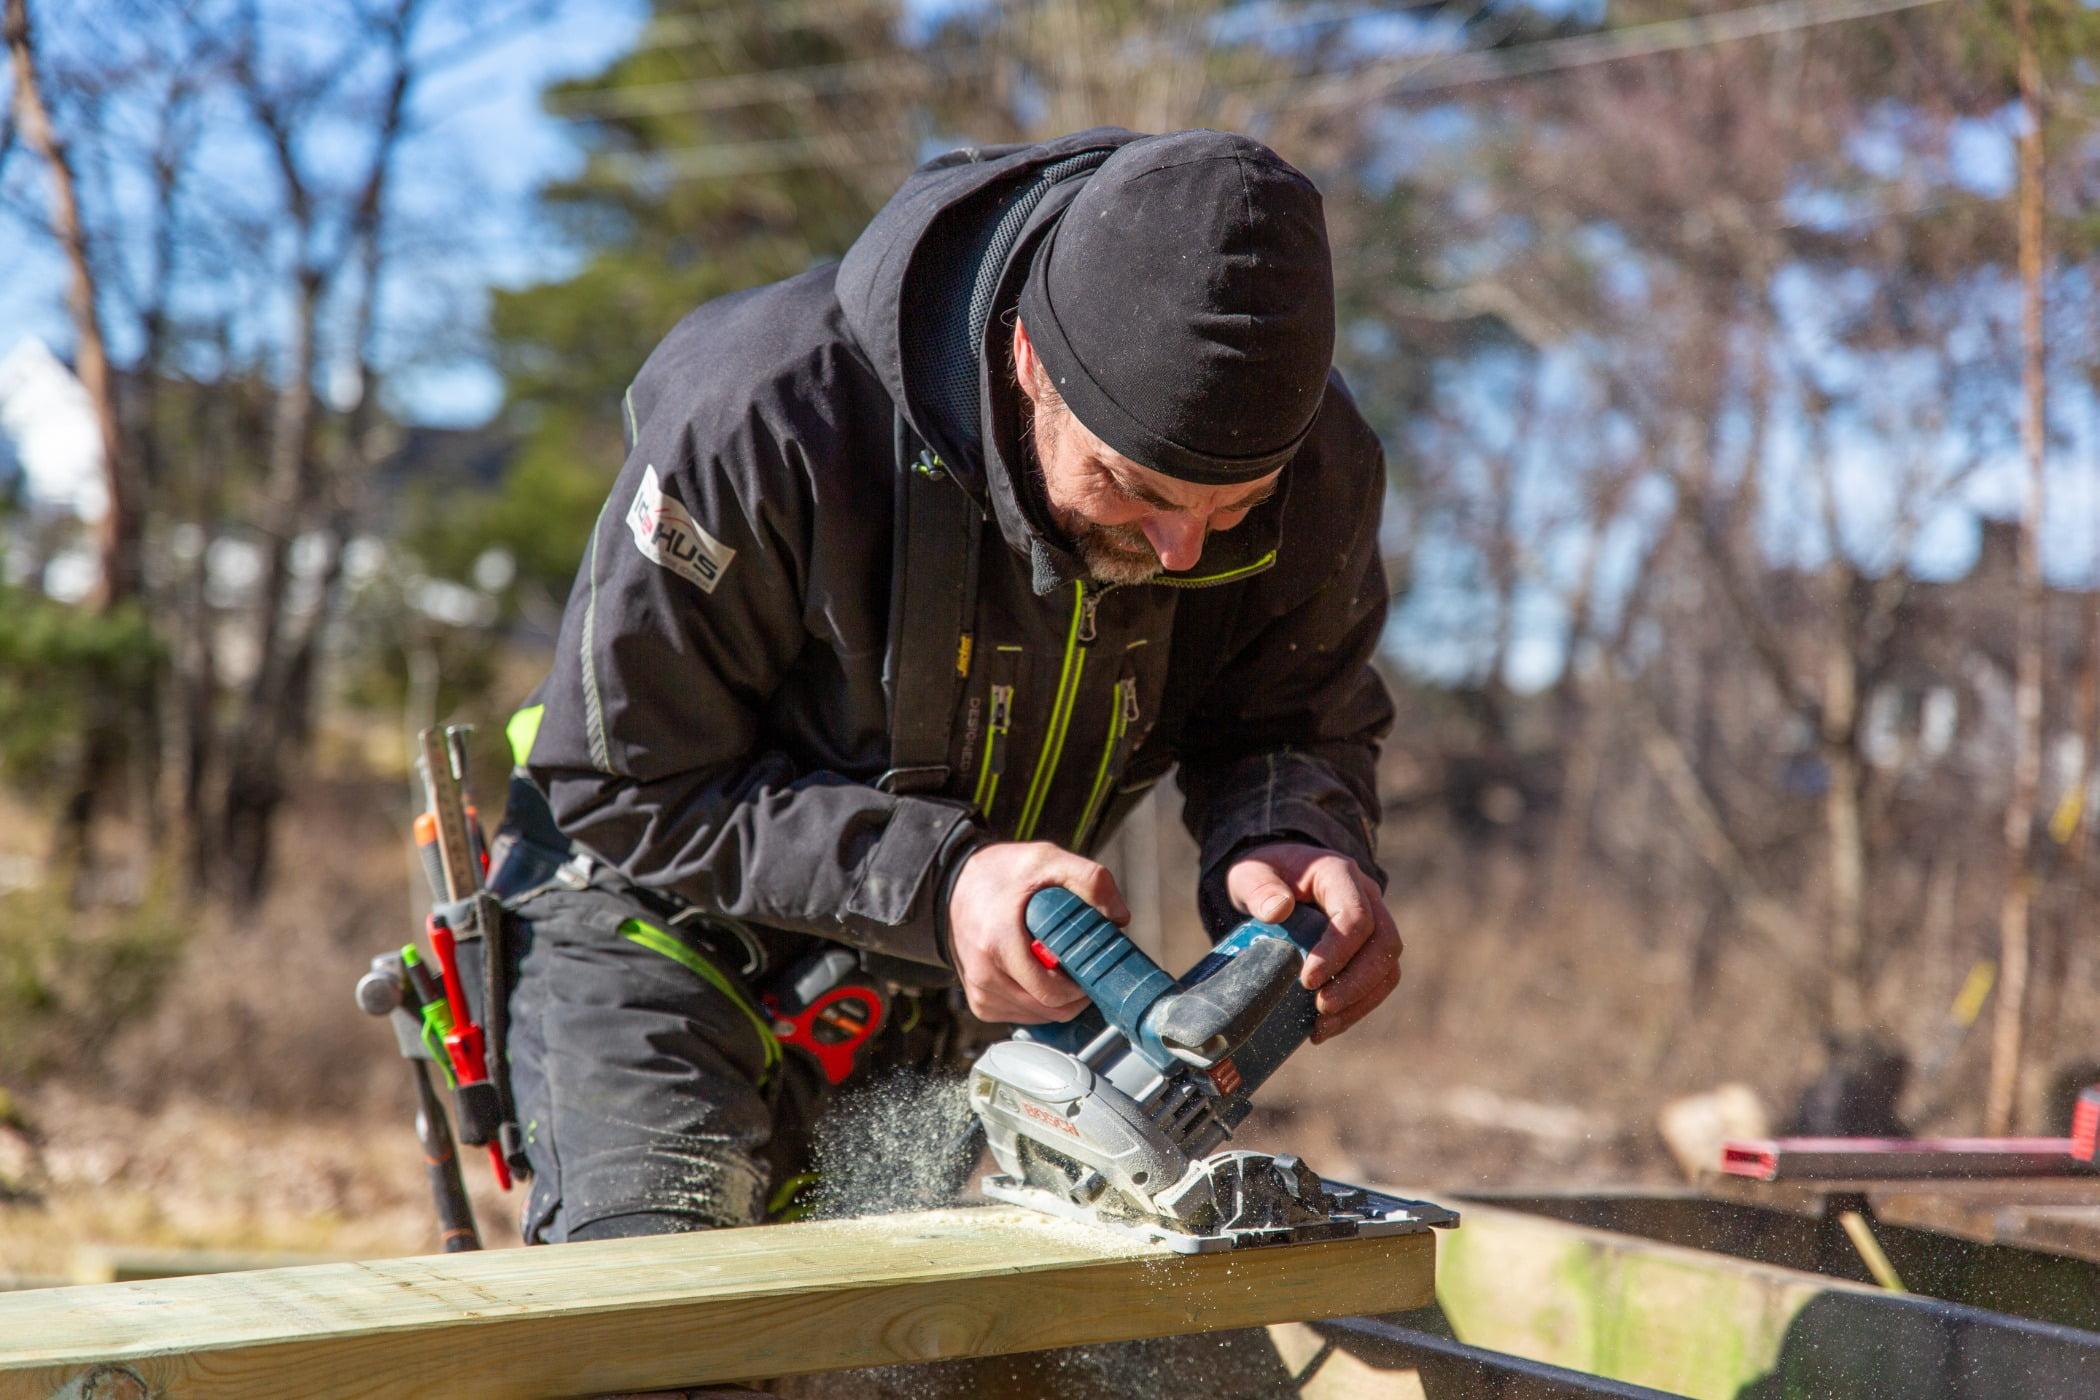 Saw chain, Tradesman, Chainsaw, Tree, Wood, Glove